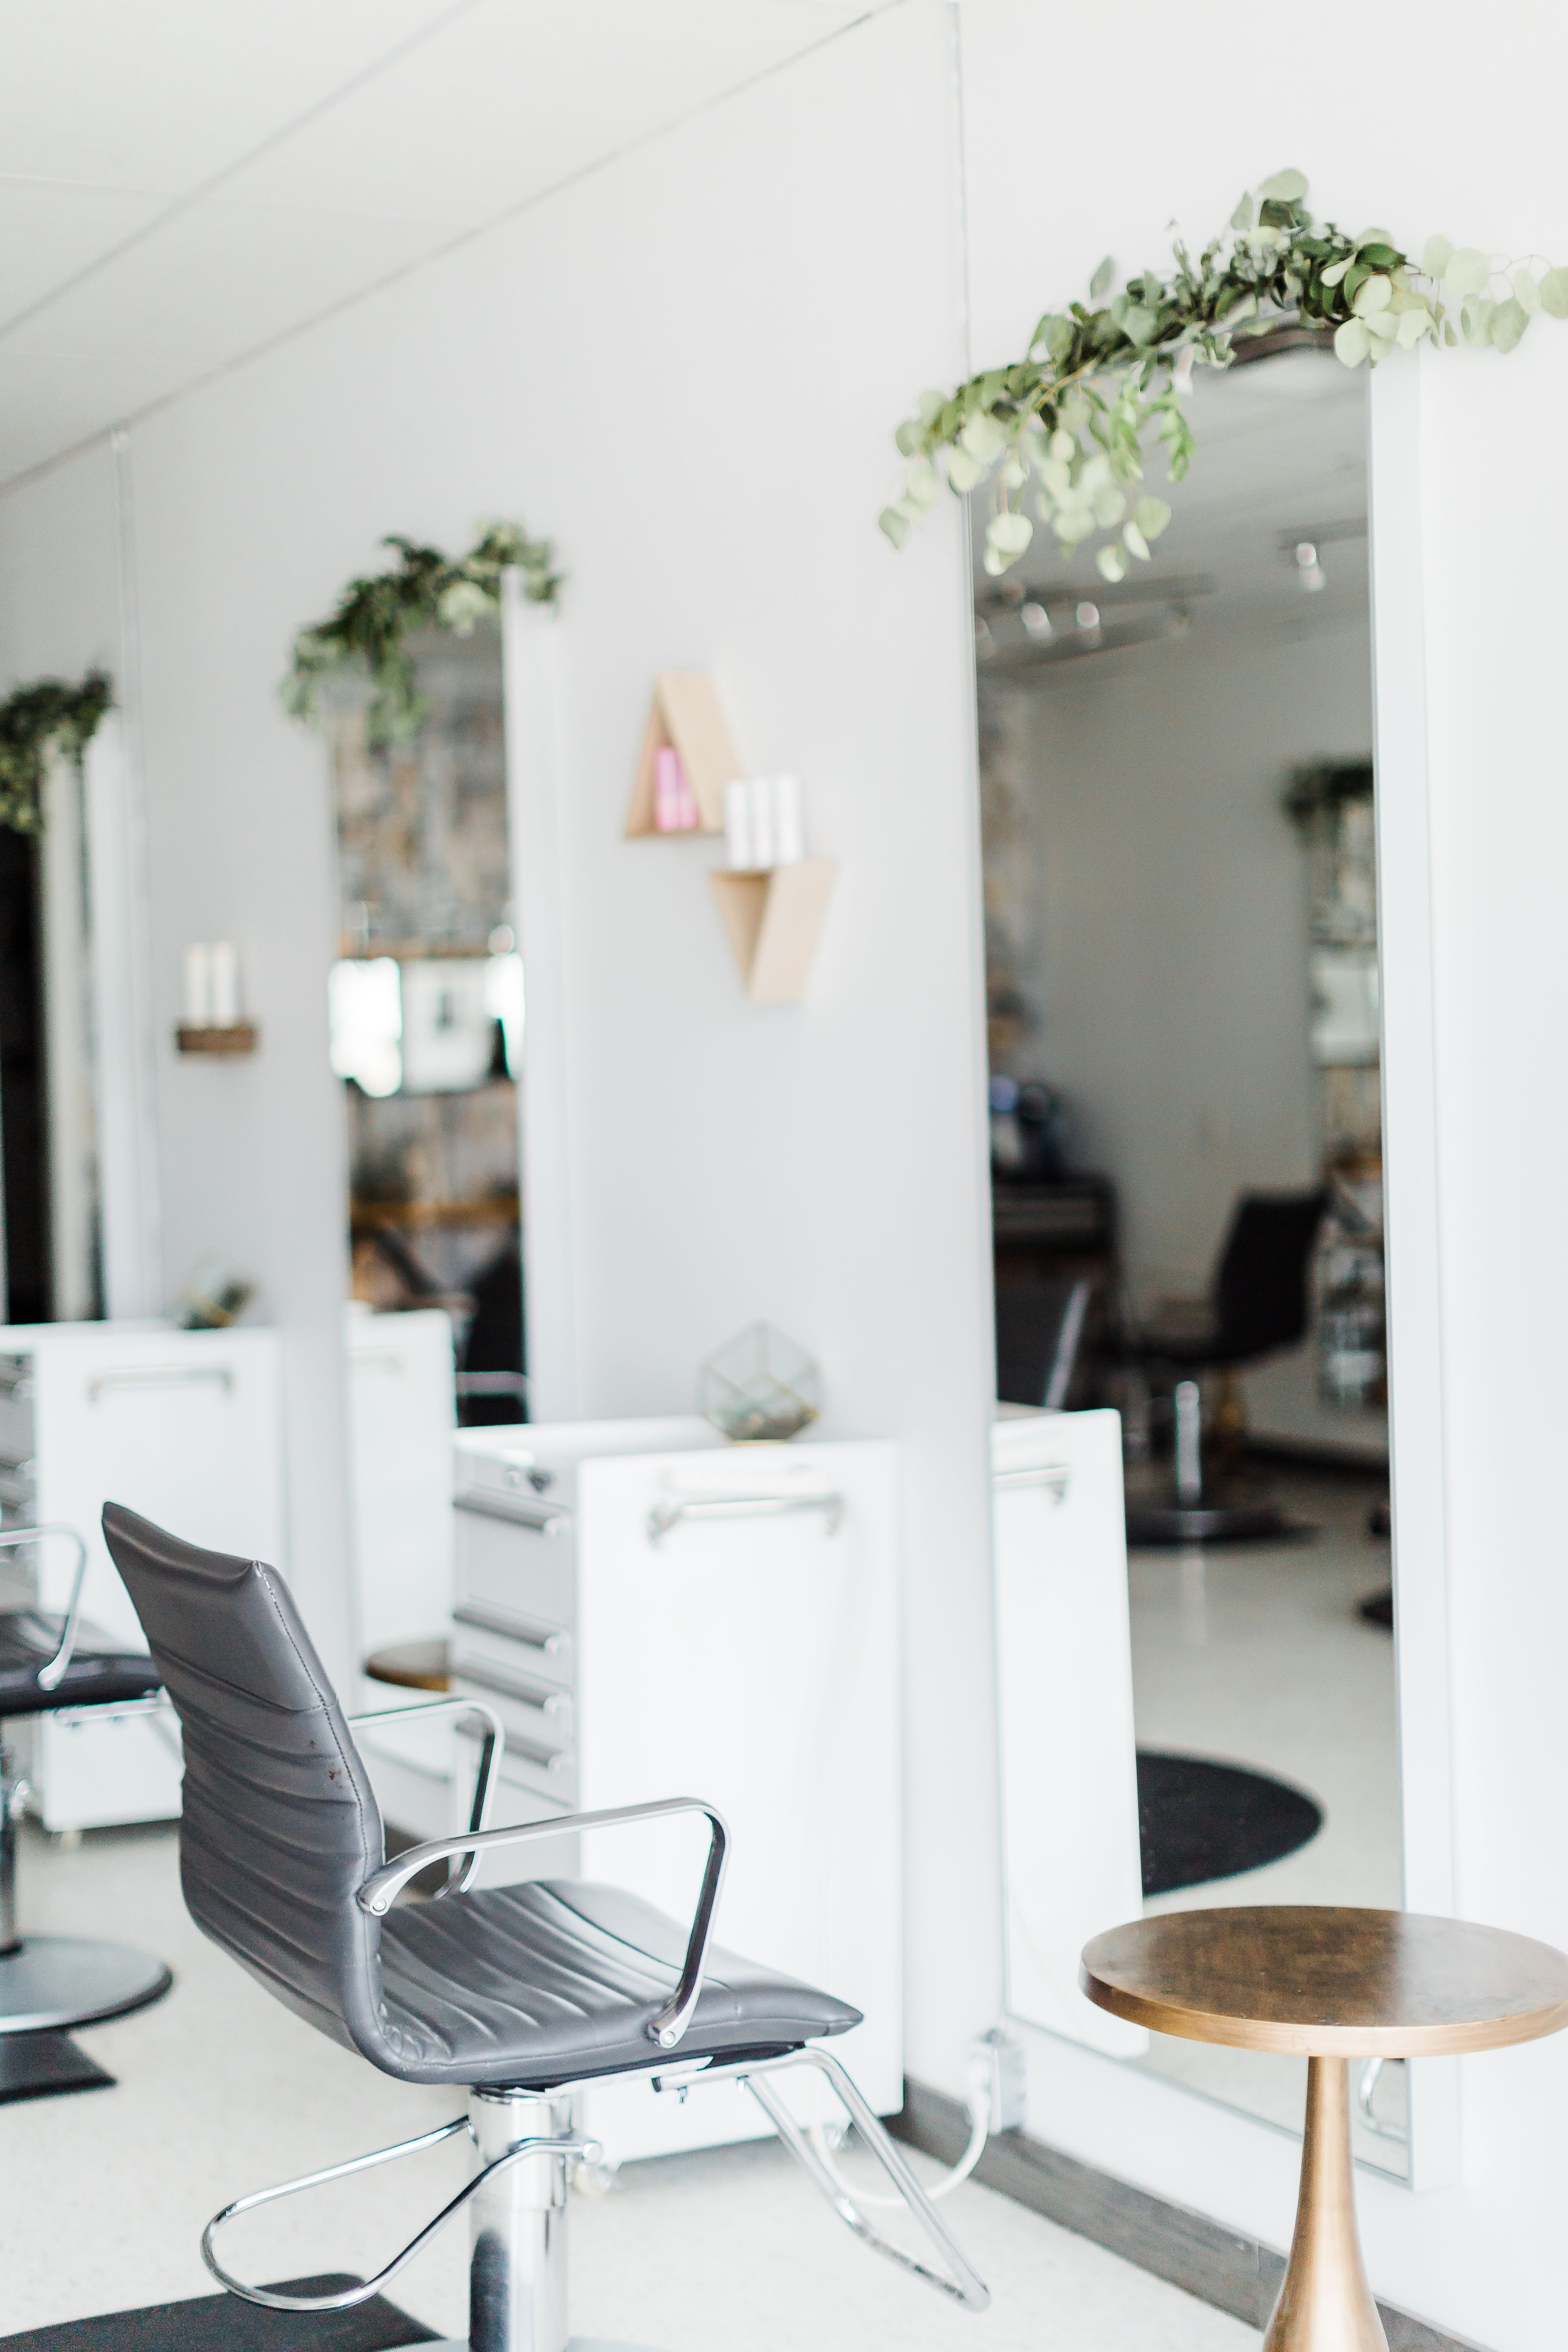 SALON decor inspiration from hairologystudio_ clean